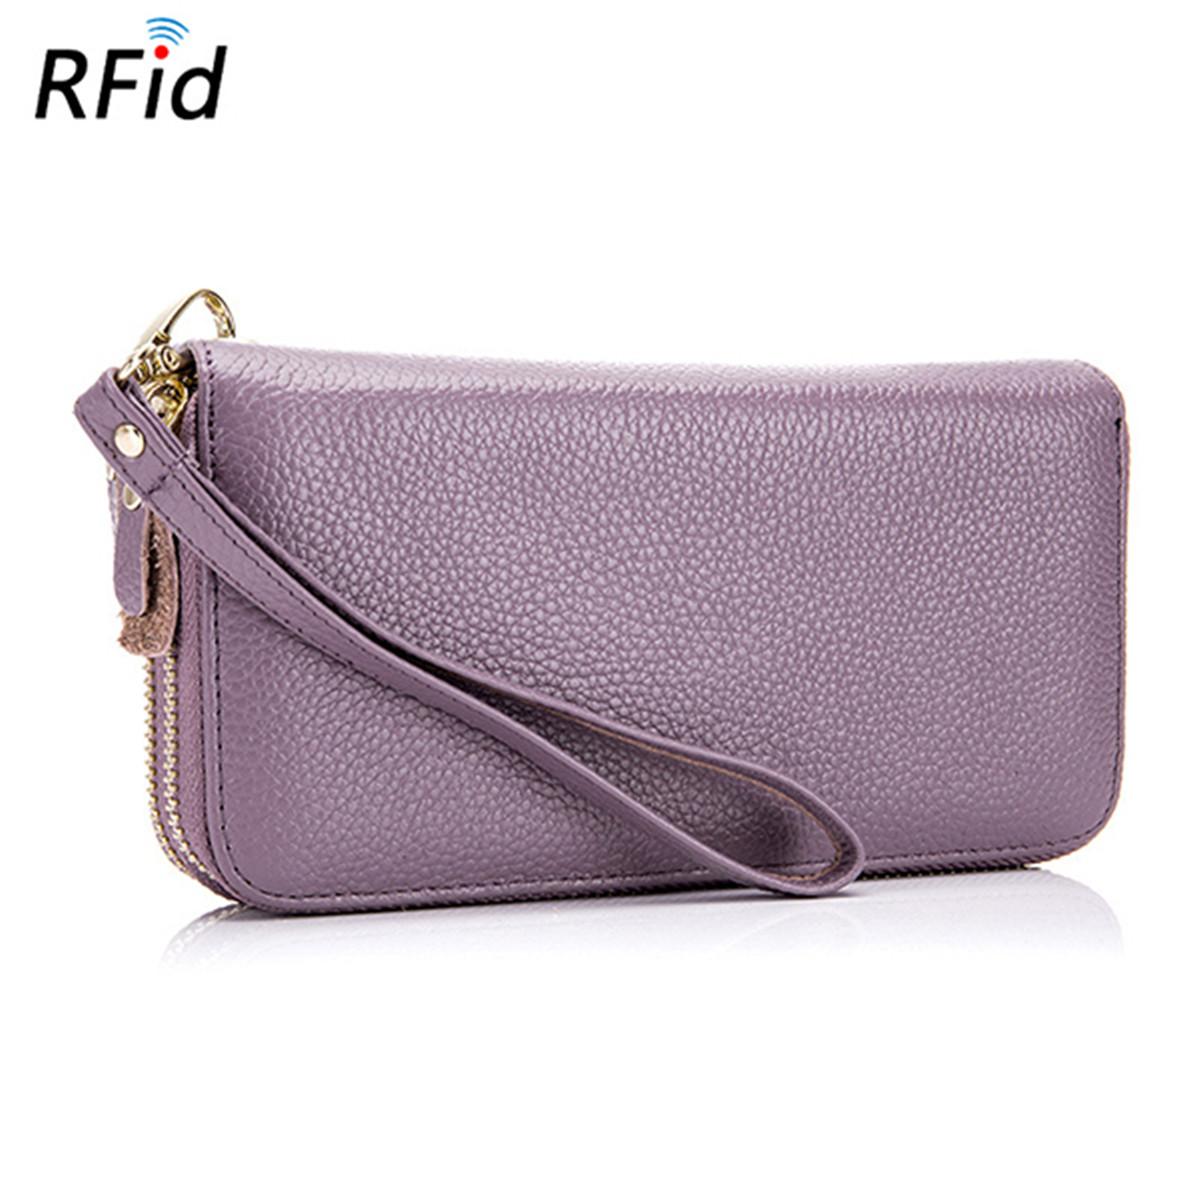 Men-Women-RFID-Genuine-Leather-Long-Wallet-Clutch-Phone-Bag-Card-Holder-Purse